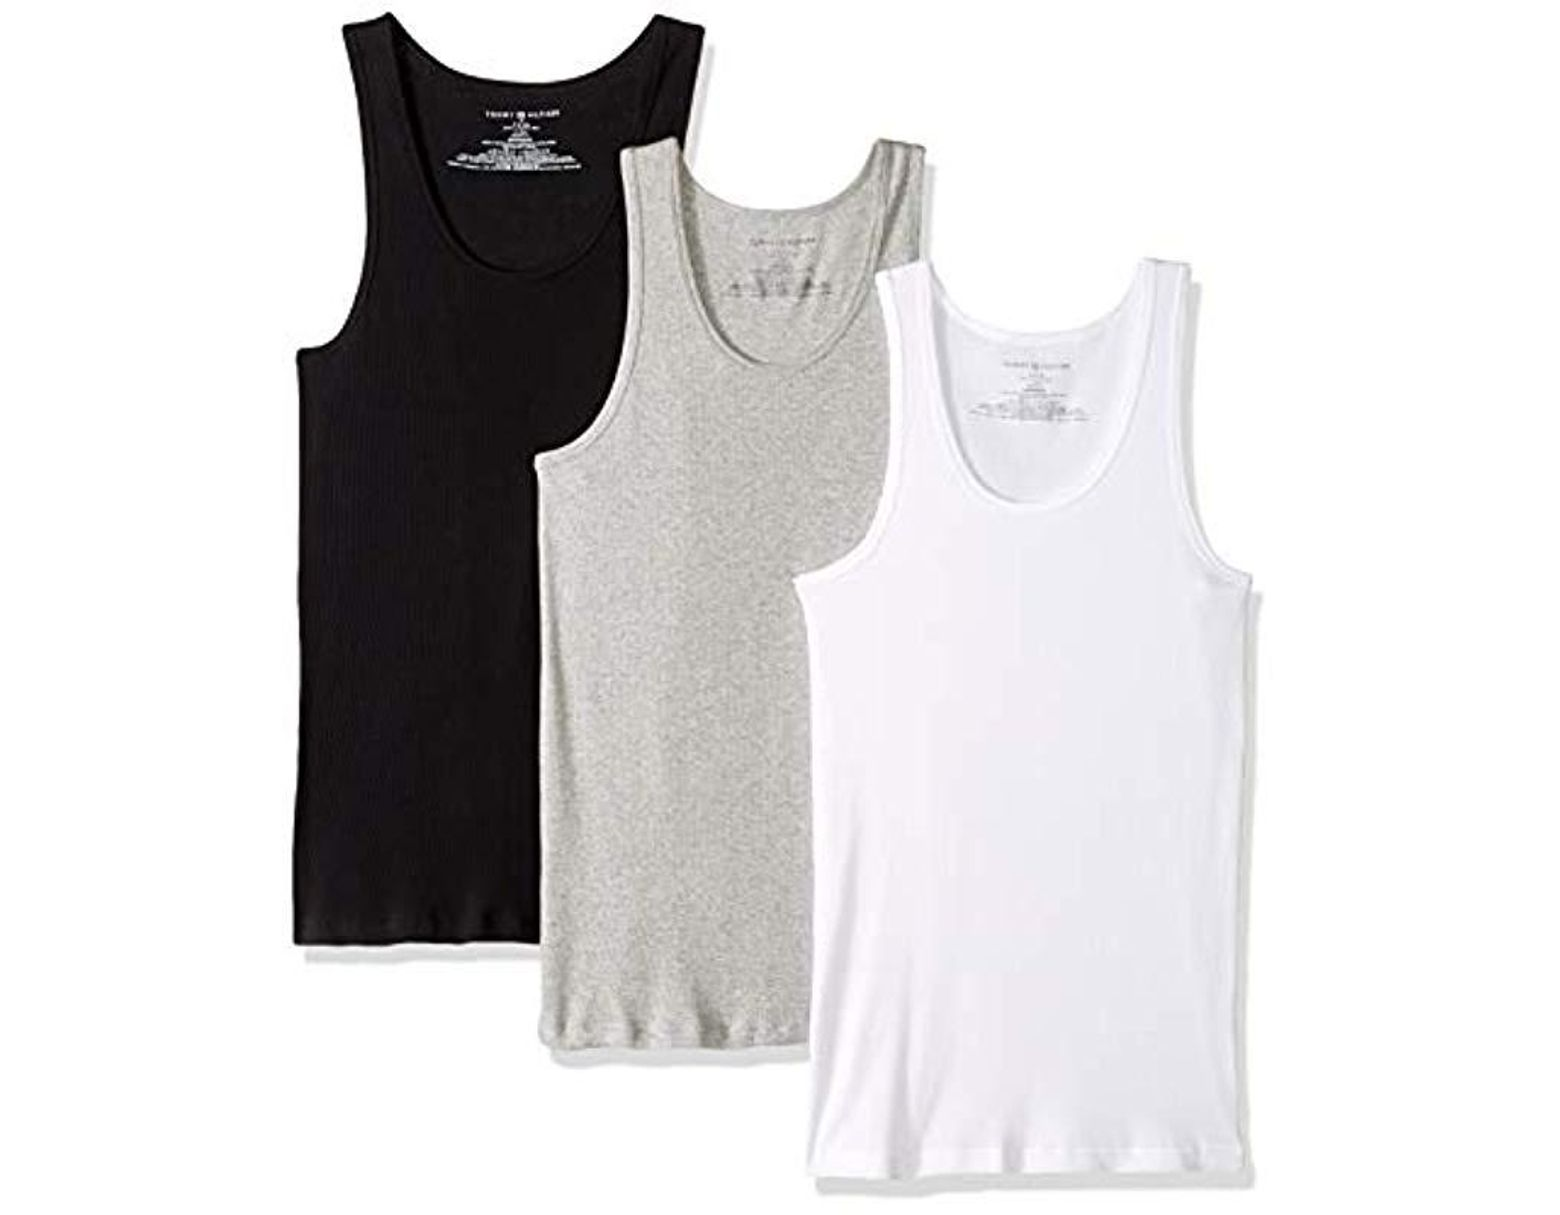 TOMMY HILFIGER Mens Undershirts 3 Pack Cotton Classics Crew Neck T-Shirt  Underwear